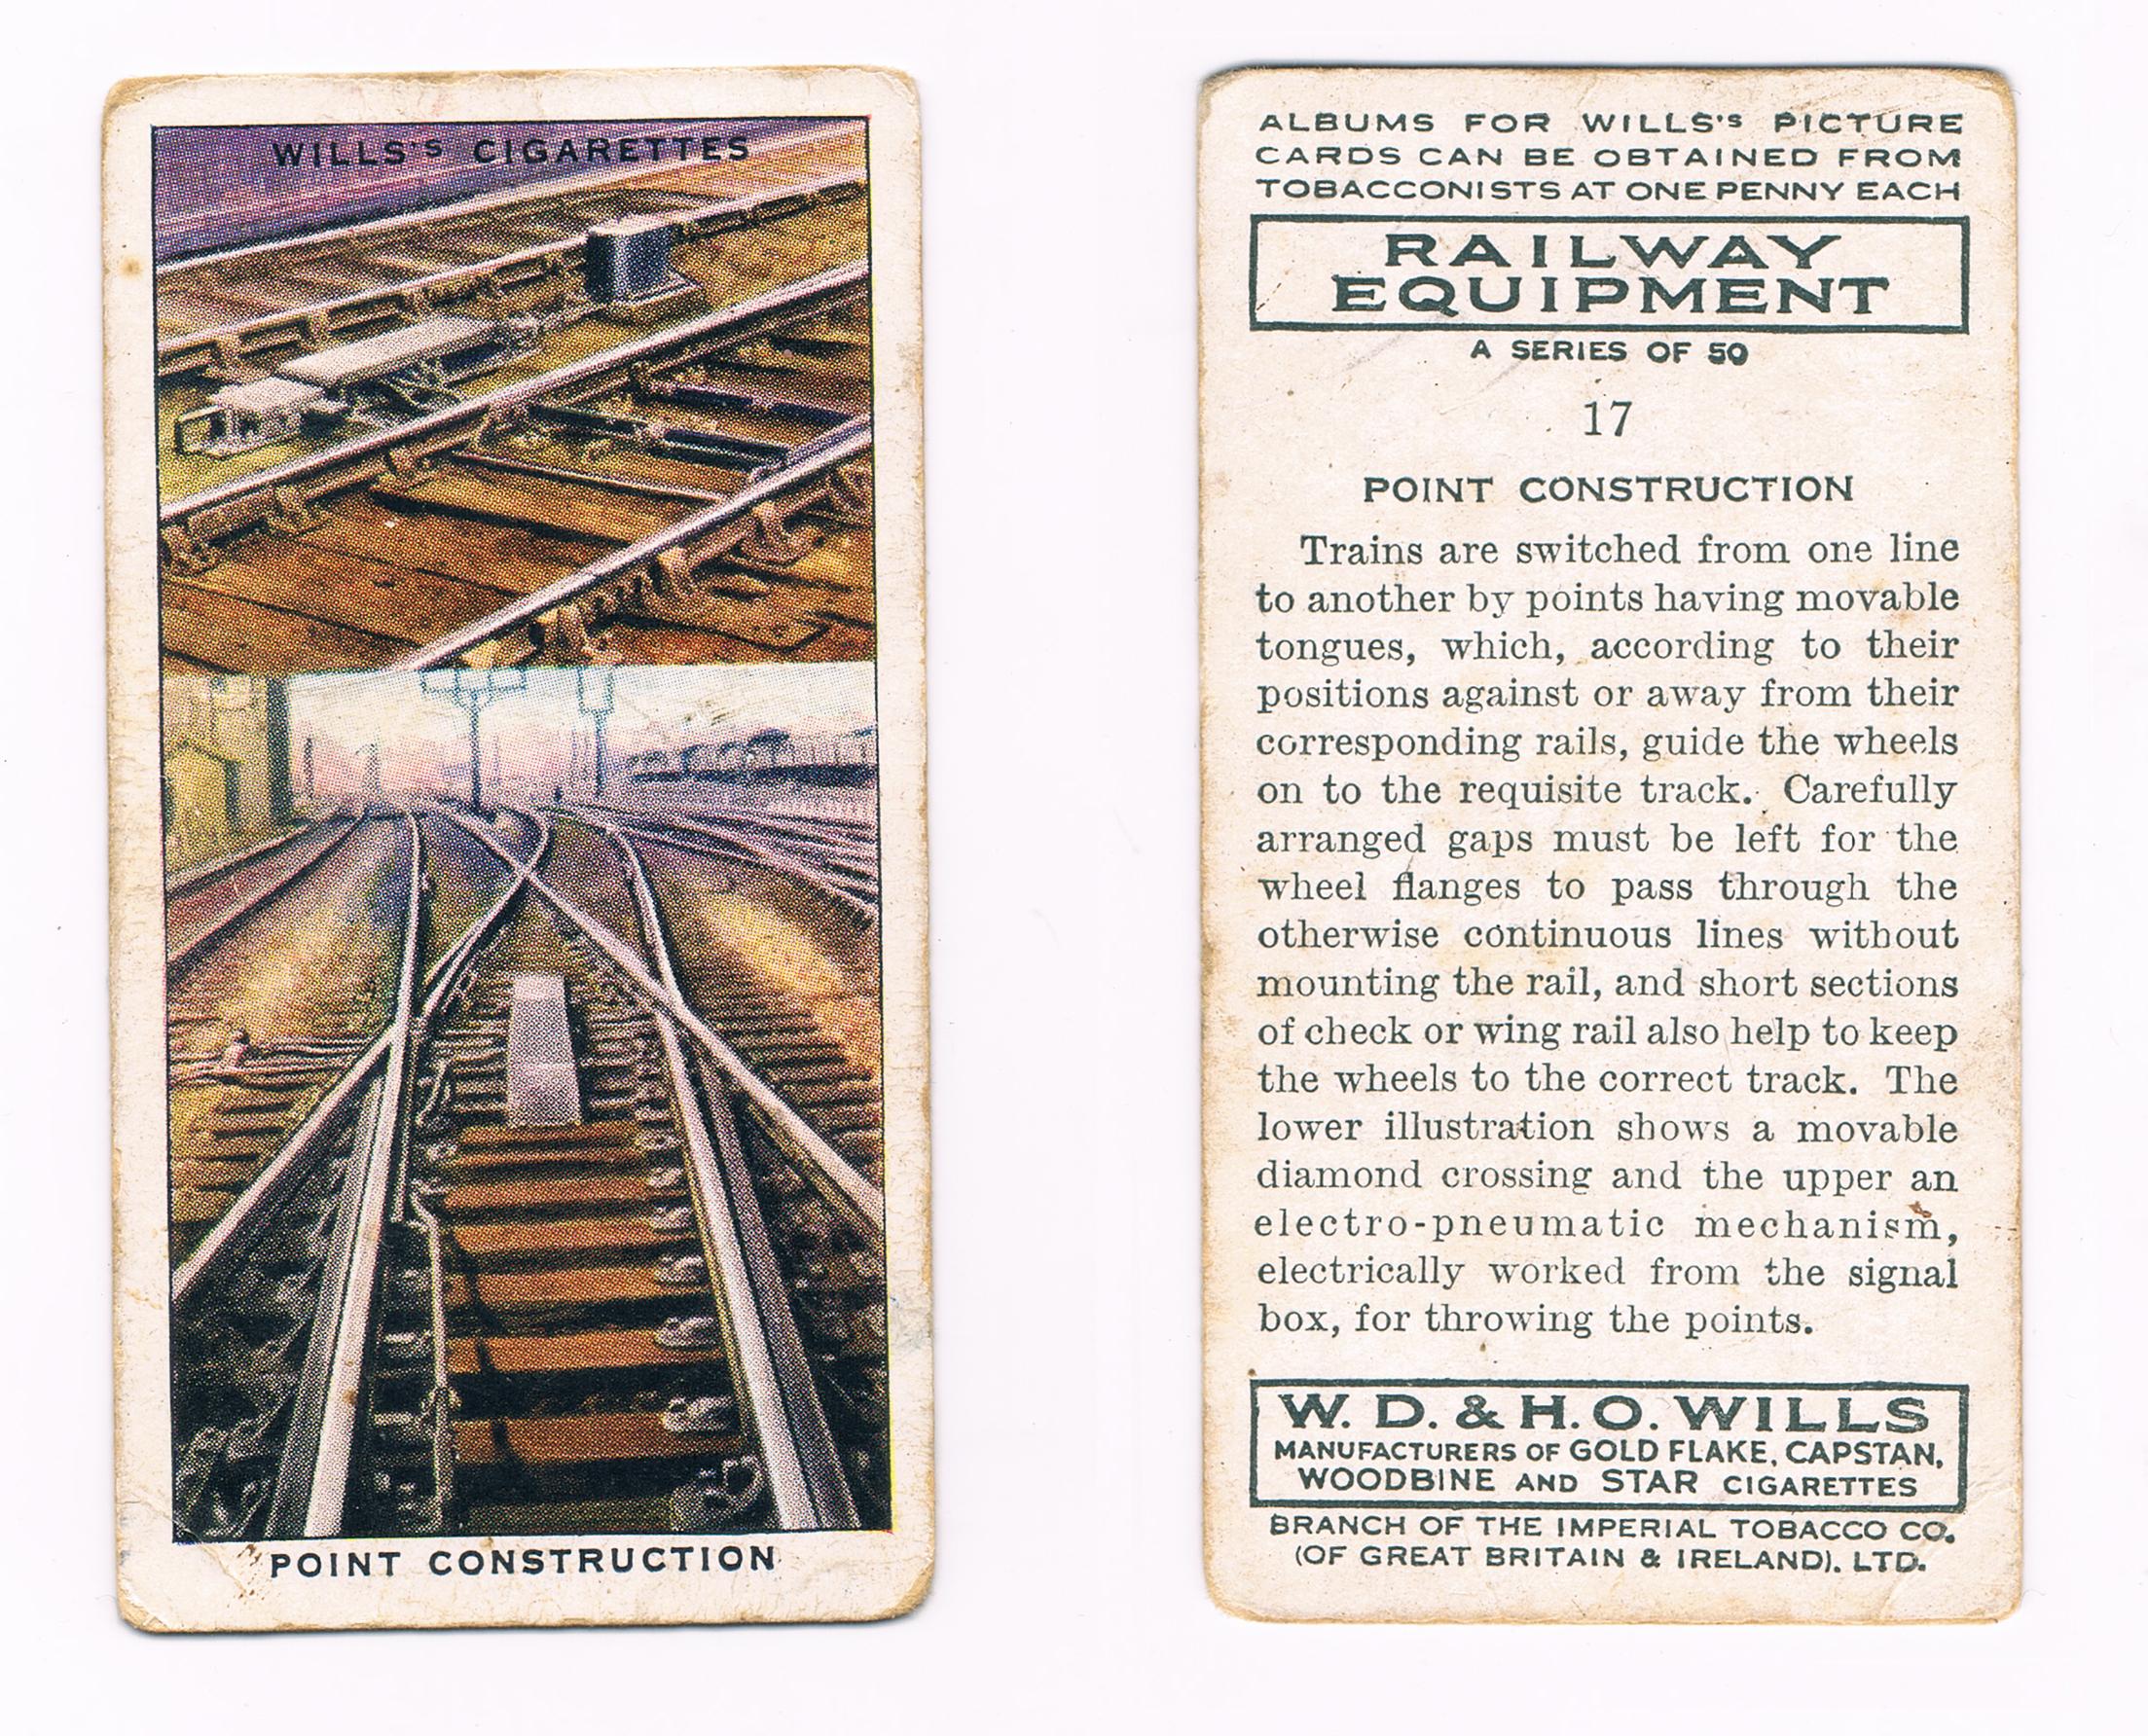 wills cigarettes card